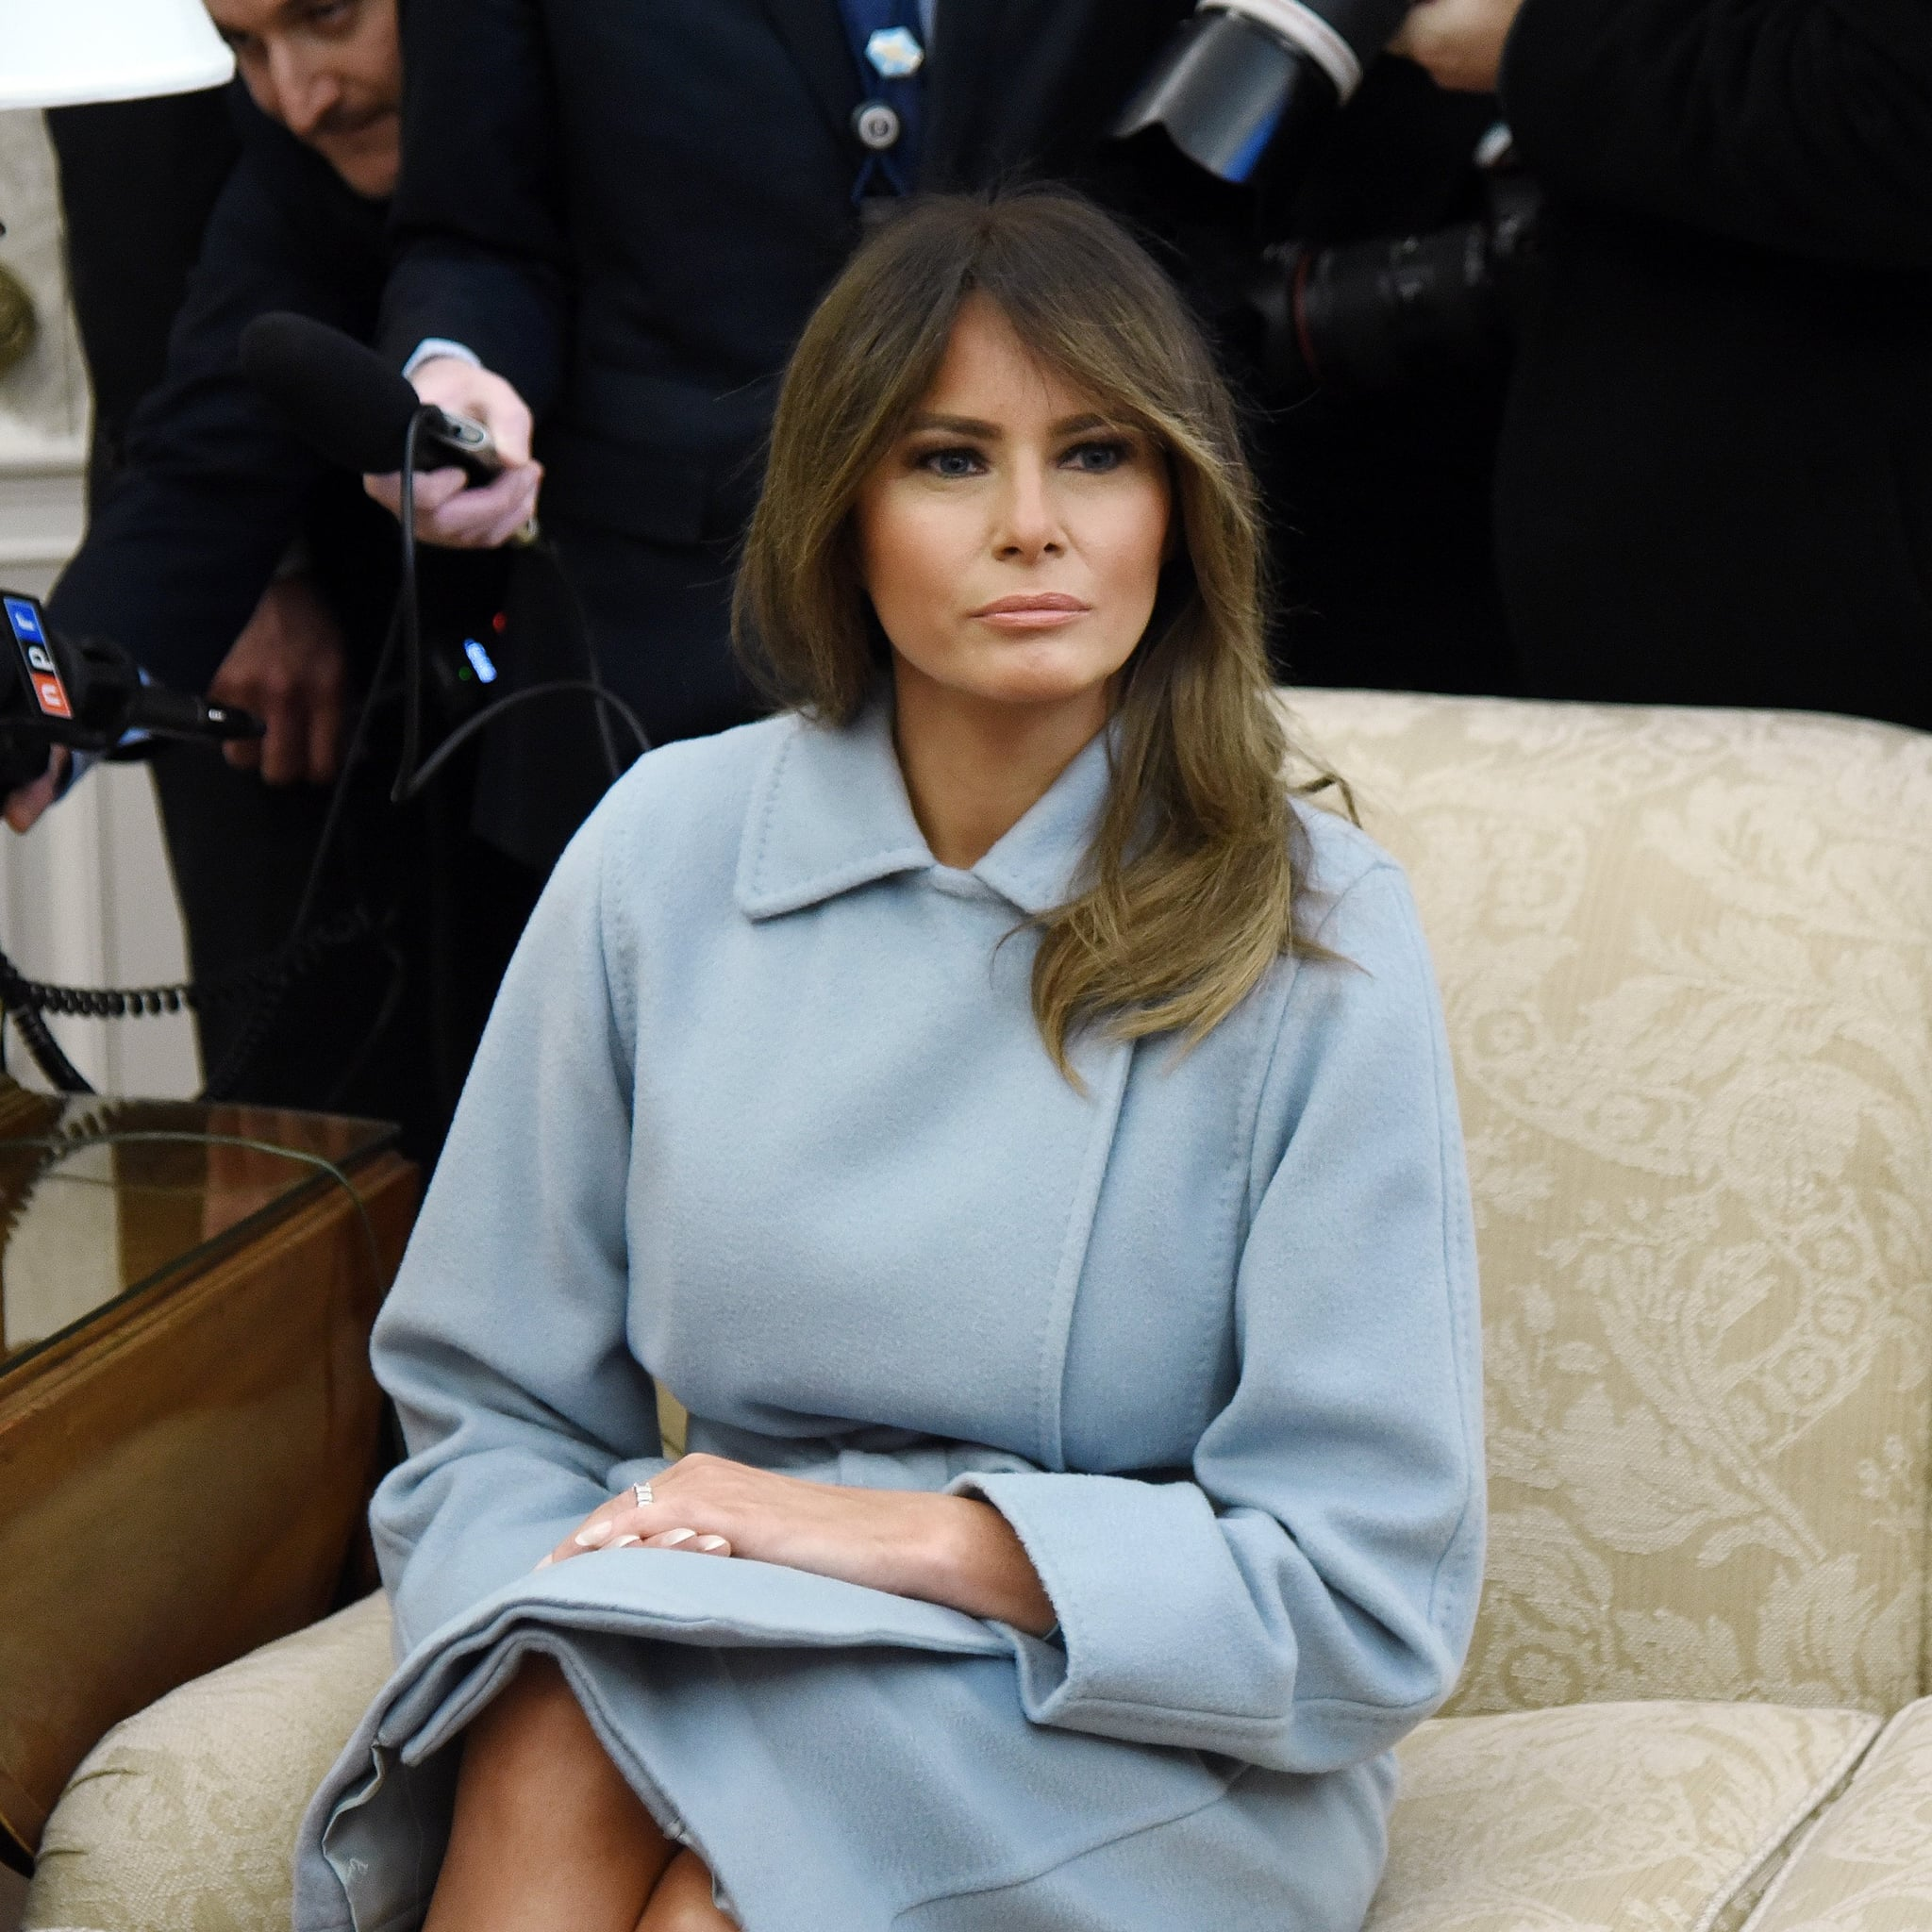 2019 Melania Trump nudes (84 photos), Topless, Fappening, Boobs, butt 2019